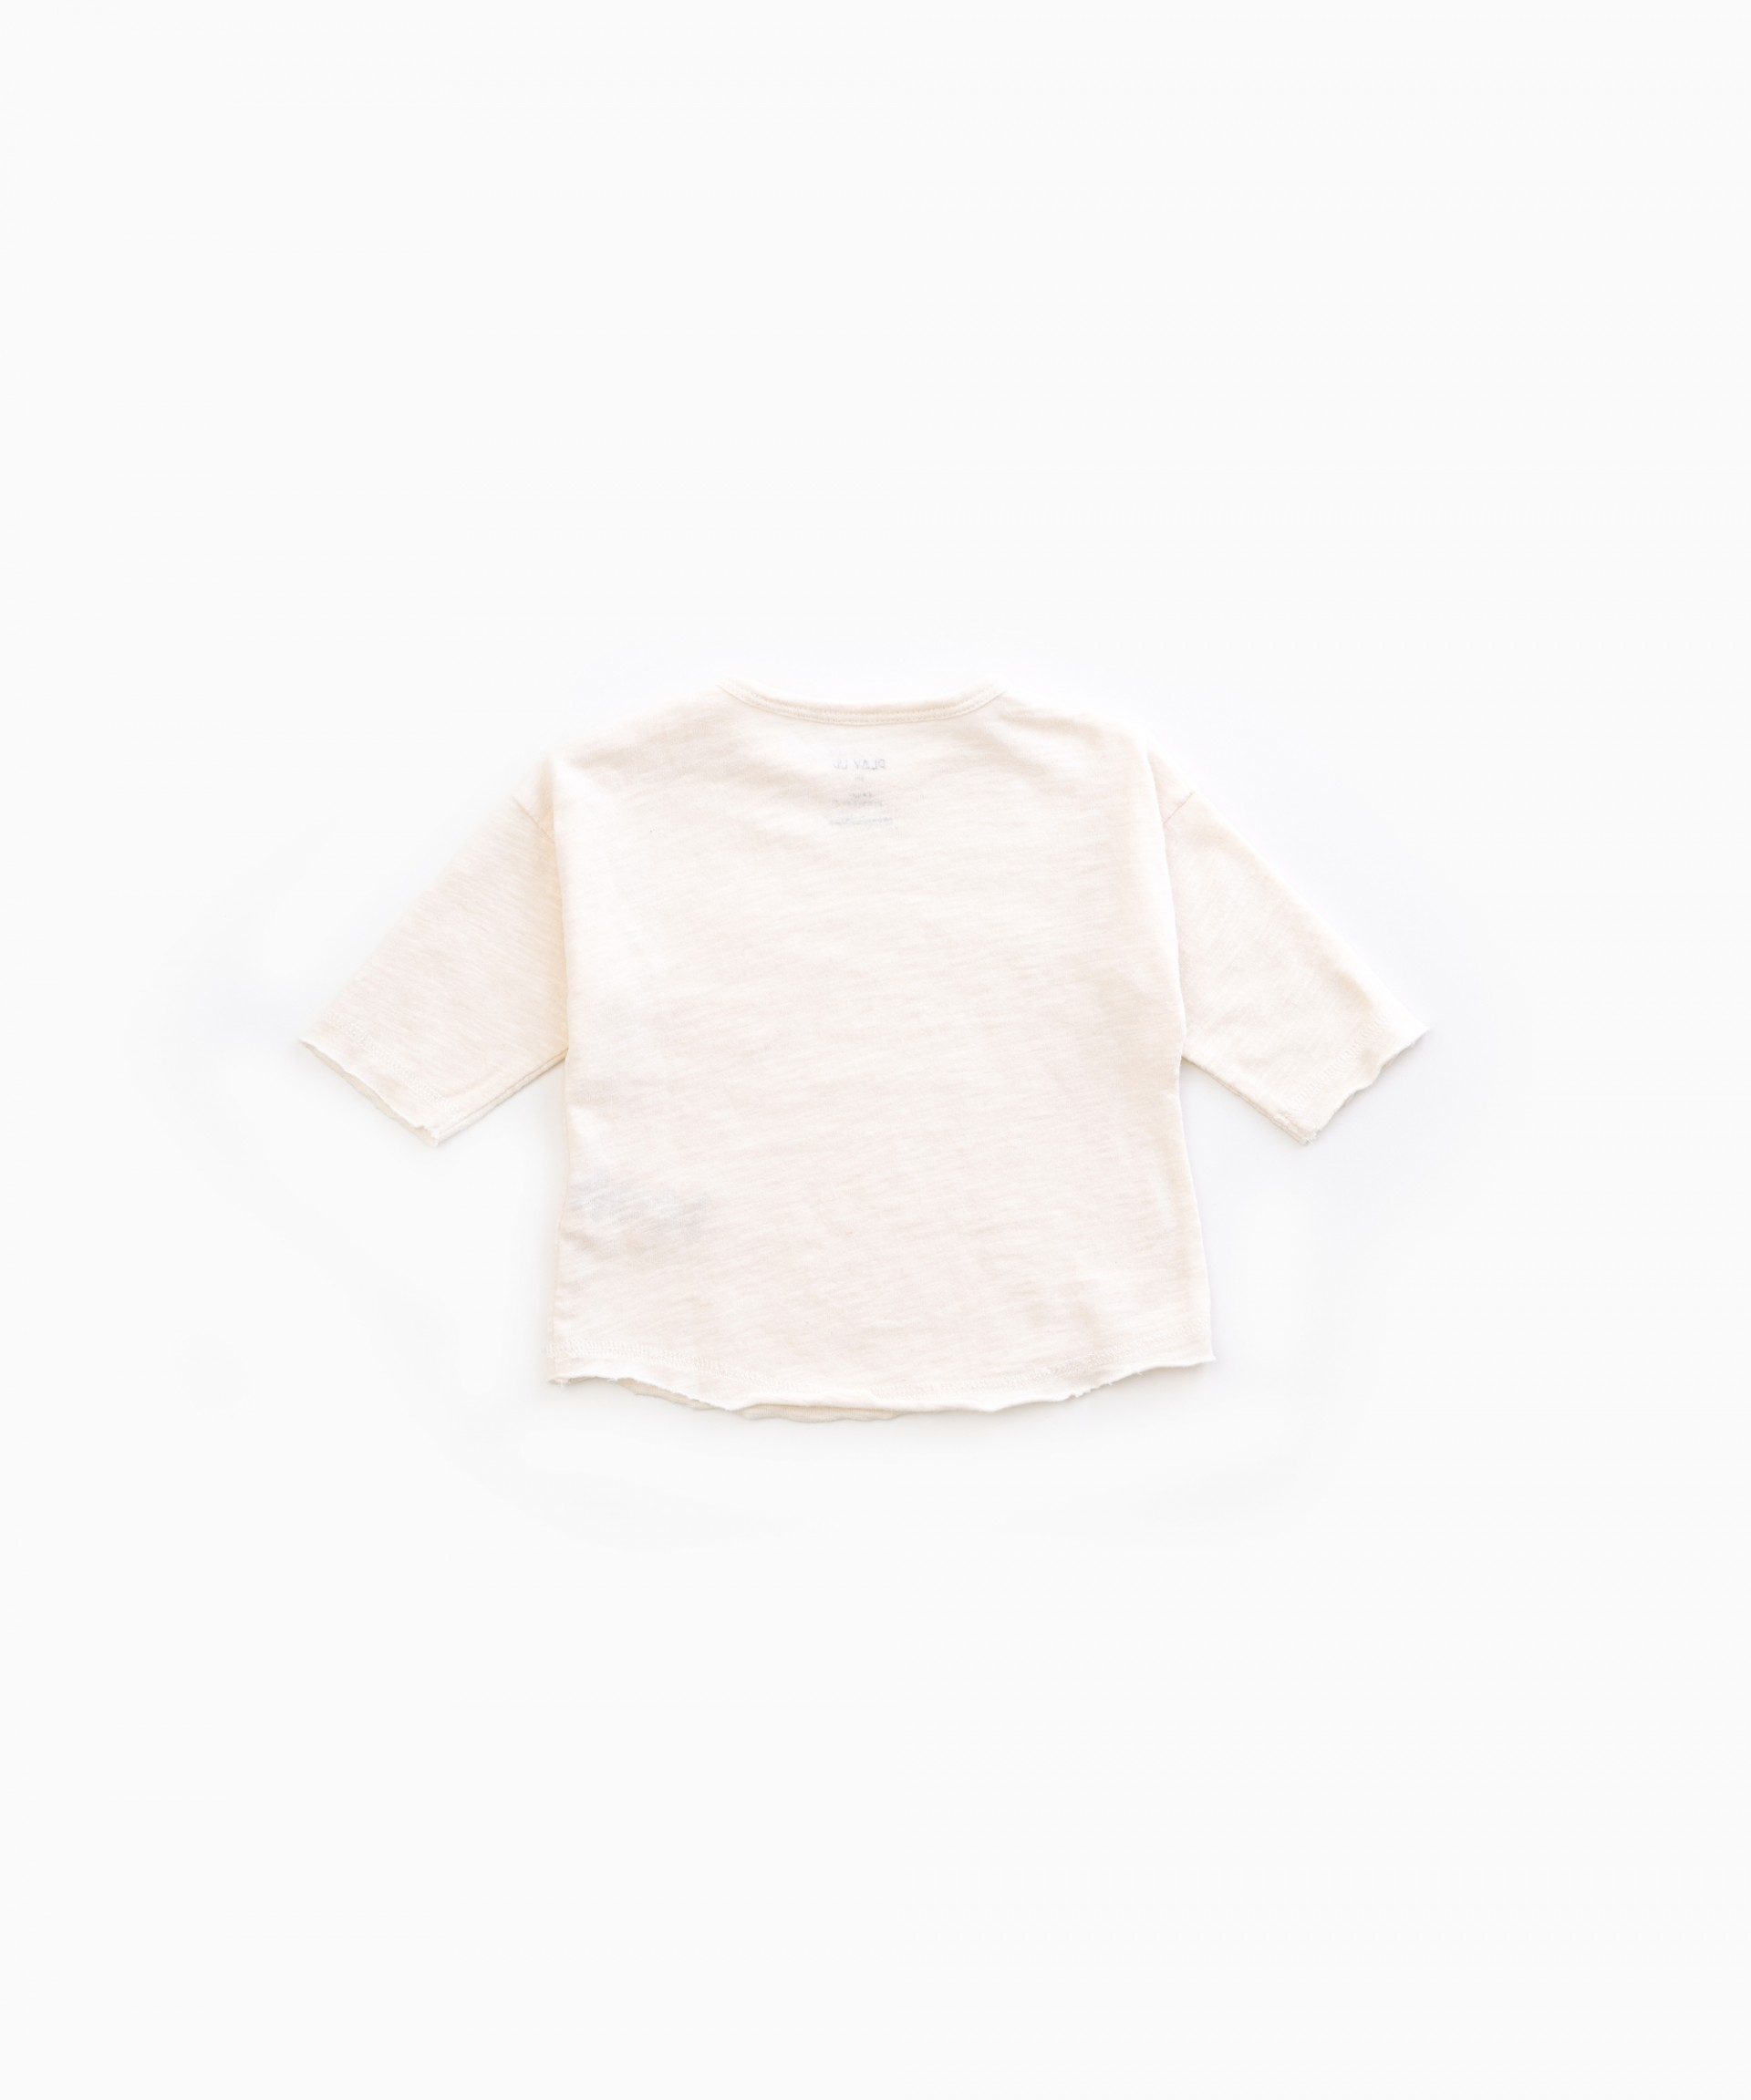 Basic 100% Organic Cotton Sweatshirt